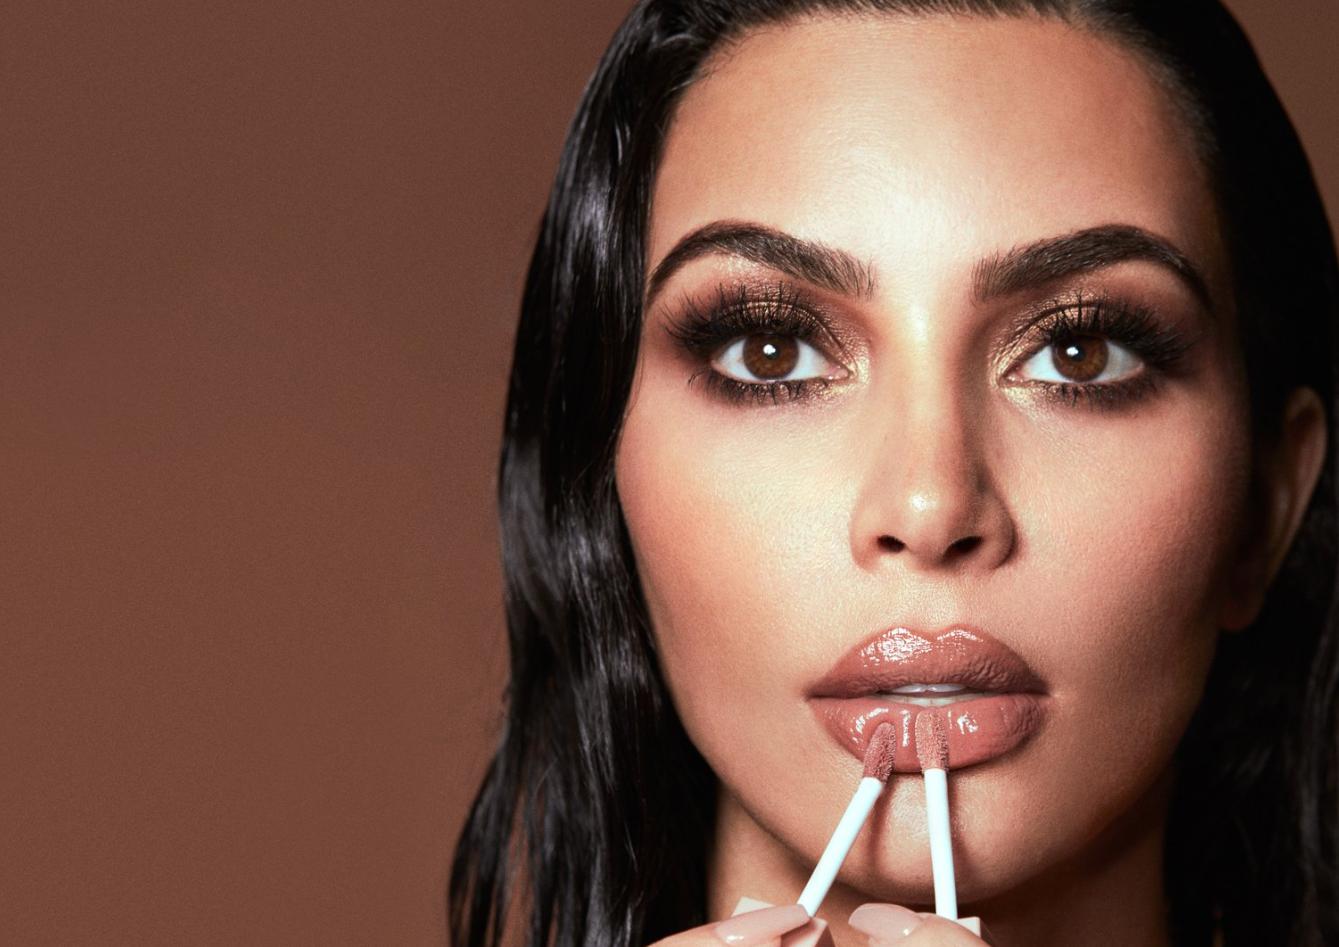 Coty将以2亿美元收购金·卡戴珊个人美妆品牌 KKW Beauty 20%股份